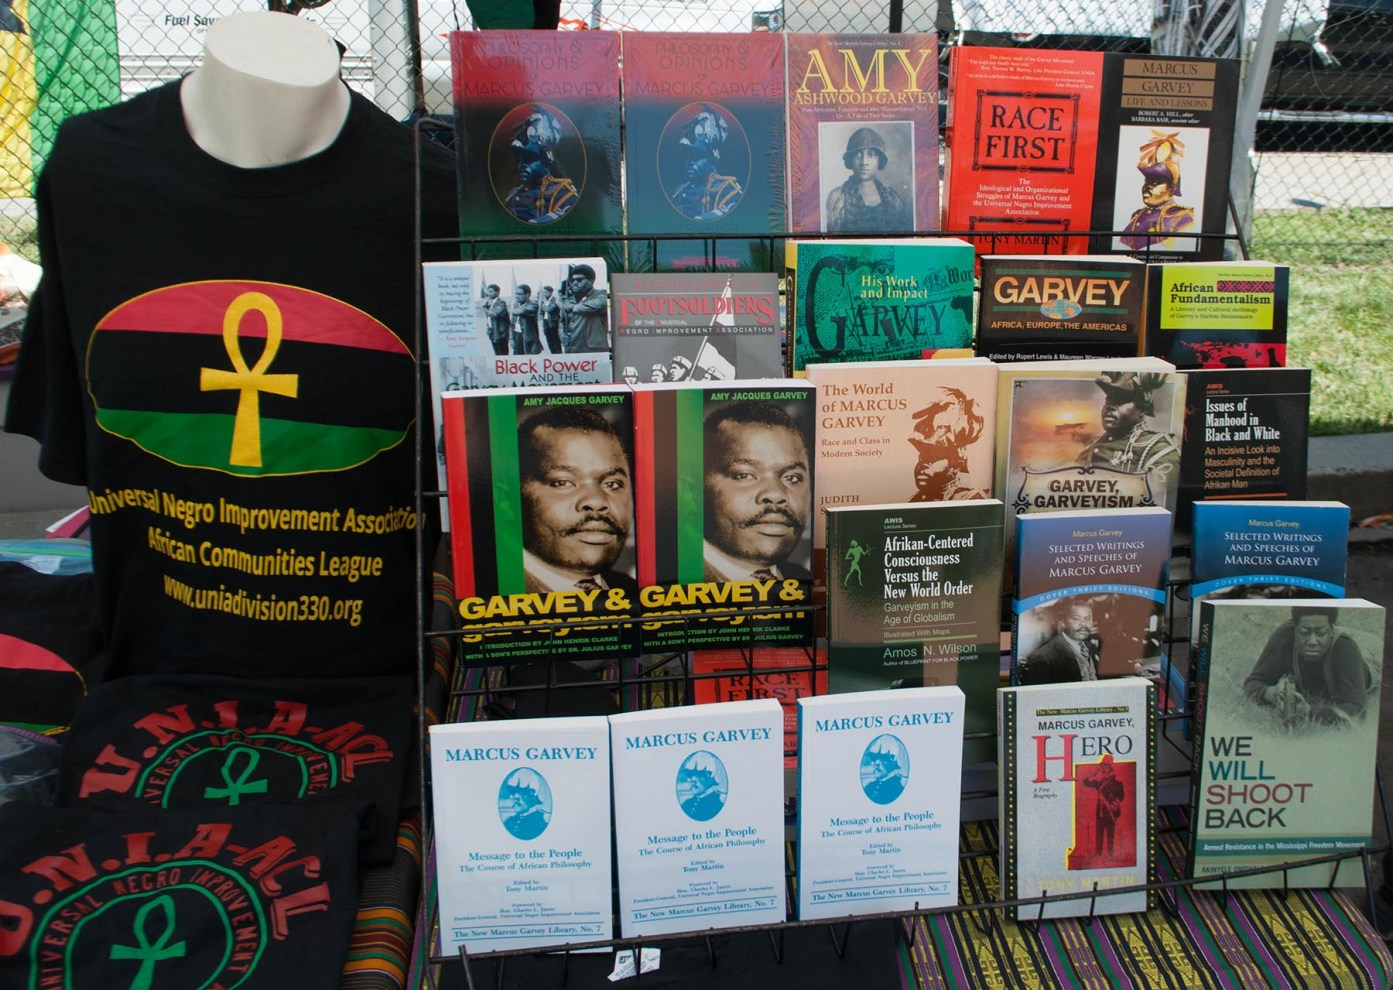 Universal-Negro-Movement-Literature-1